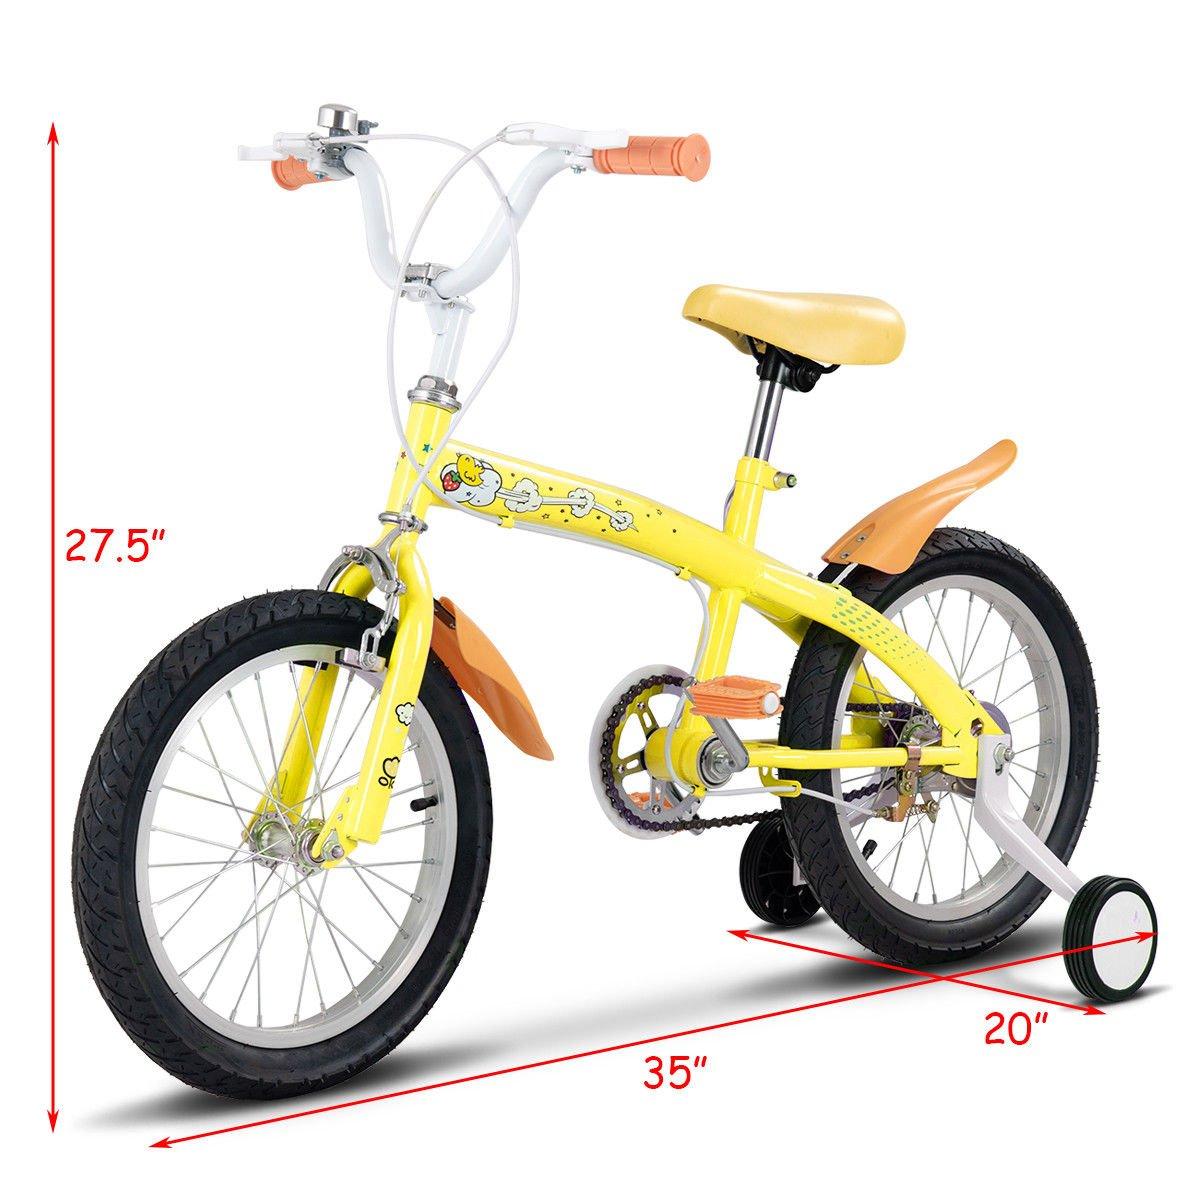 FDInspiration Yellow 45'' x 31.5'' Metal Frame Kids Bike w/Training Wheels with Ebook by FDInspiration (Image #5)